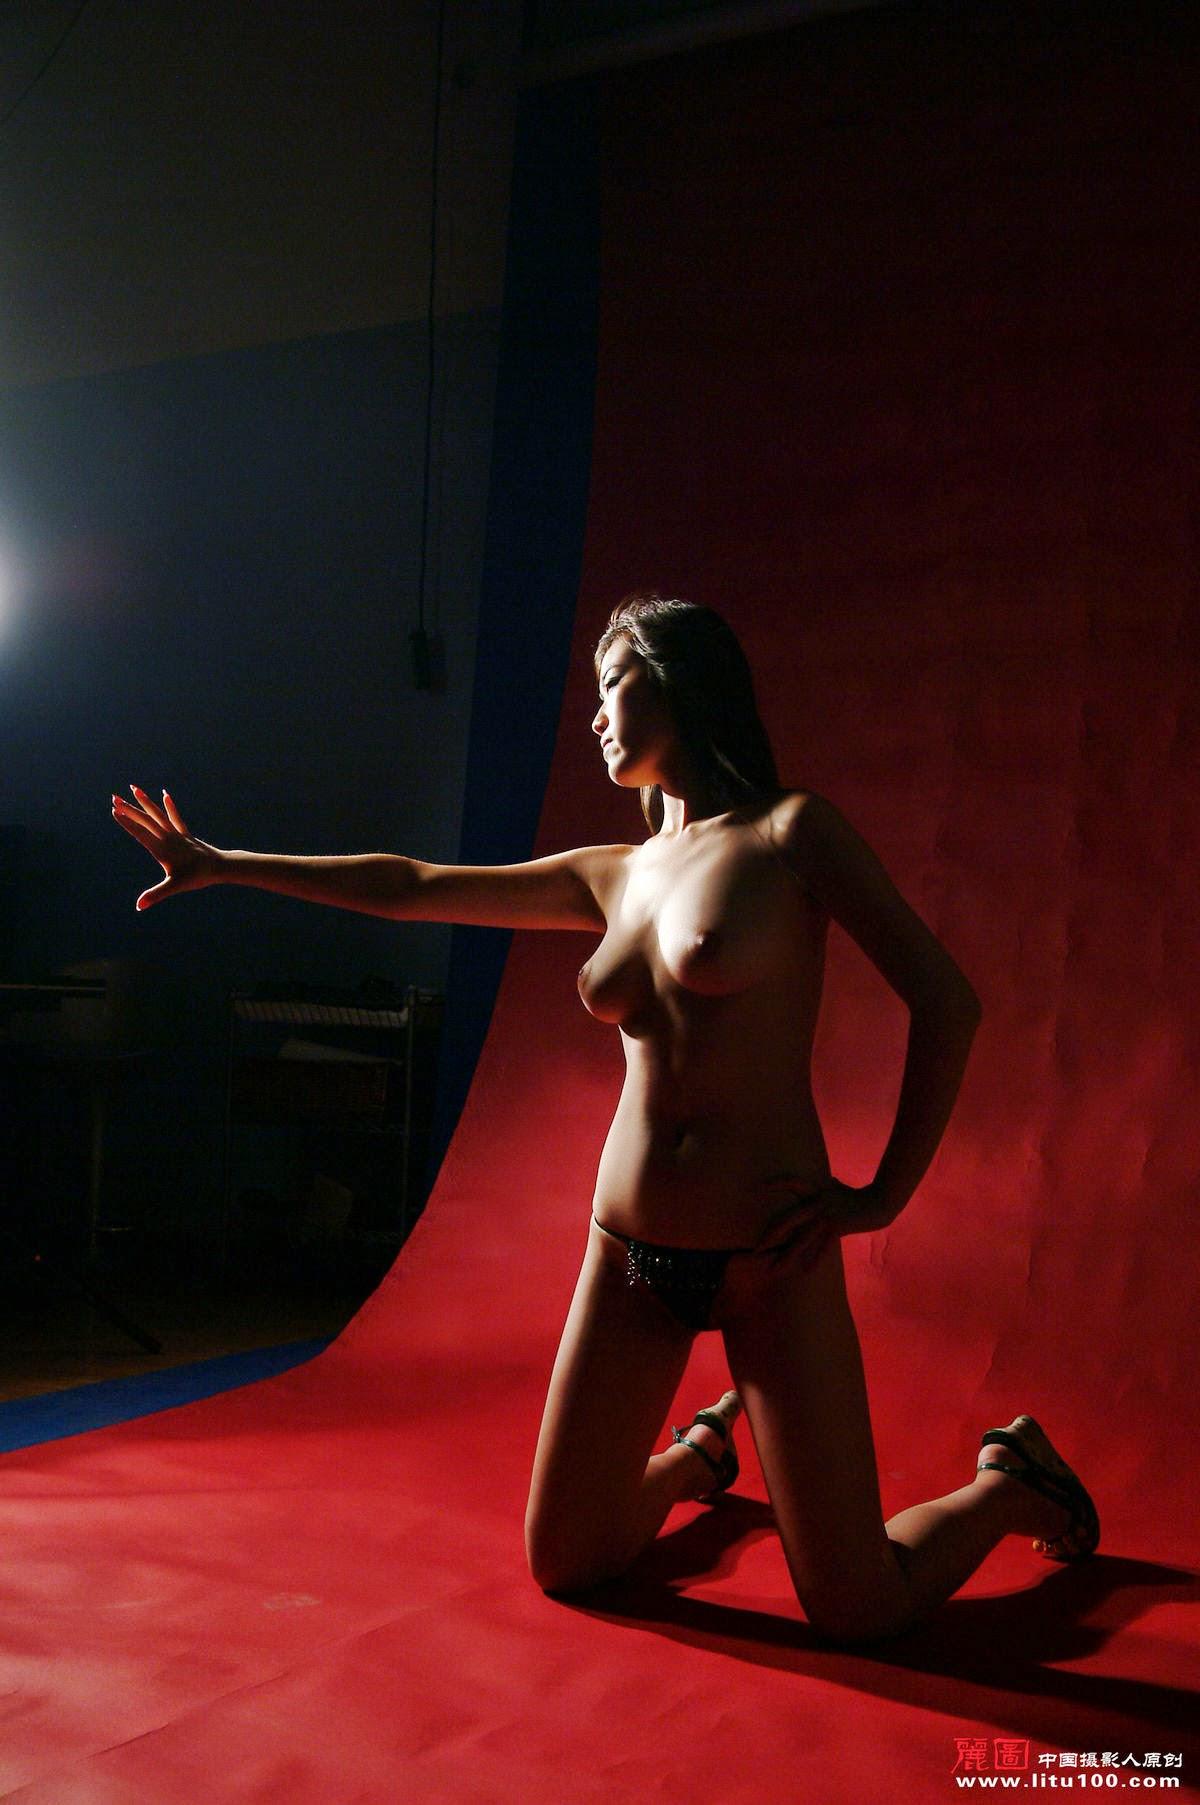 litu 100 archives: Chinese Nude Model Siao Yu [Litu100] | 18+ gallery photos set 3